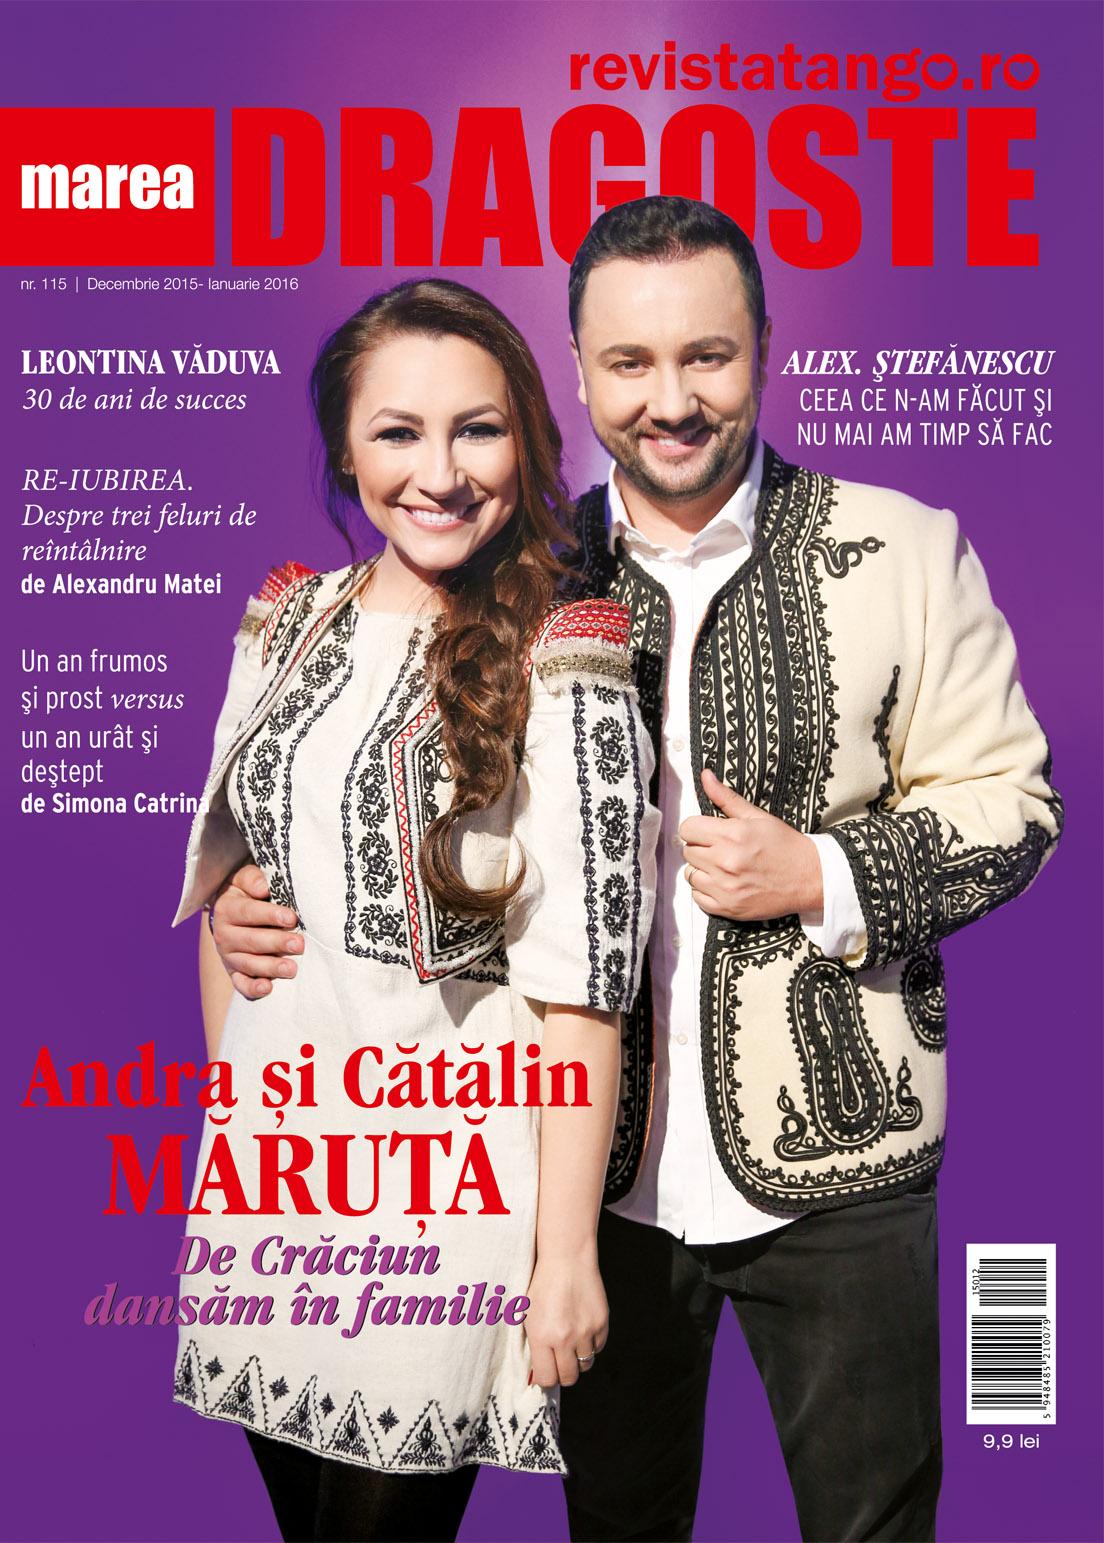 Coperta revista tango-Marea Dragoste, nr. 115, Andra si Catalin Maruta, decembrie 2015-ianuarie 2015